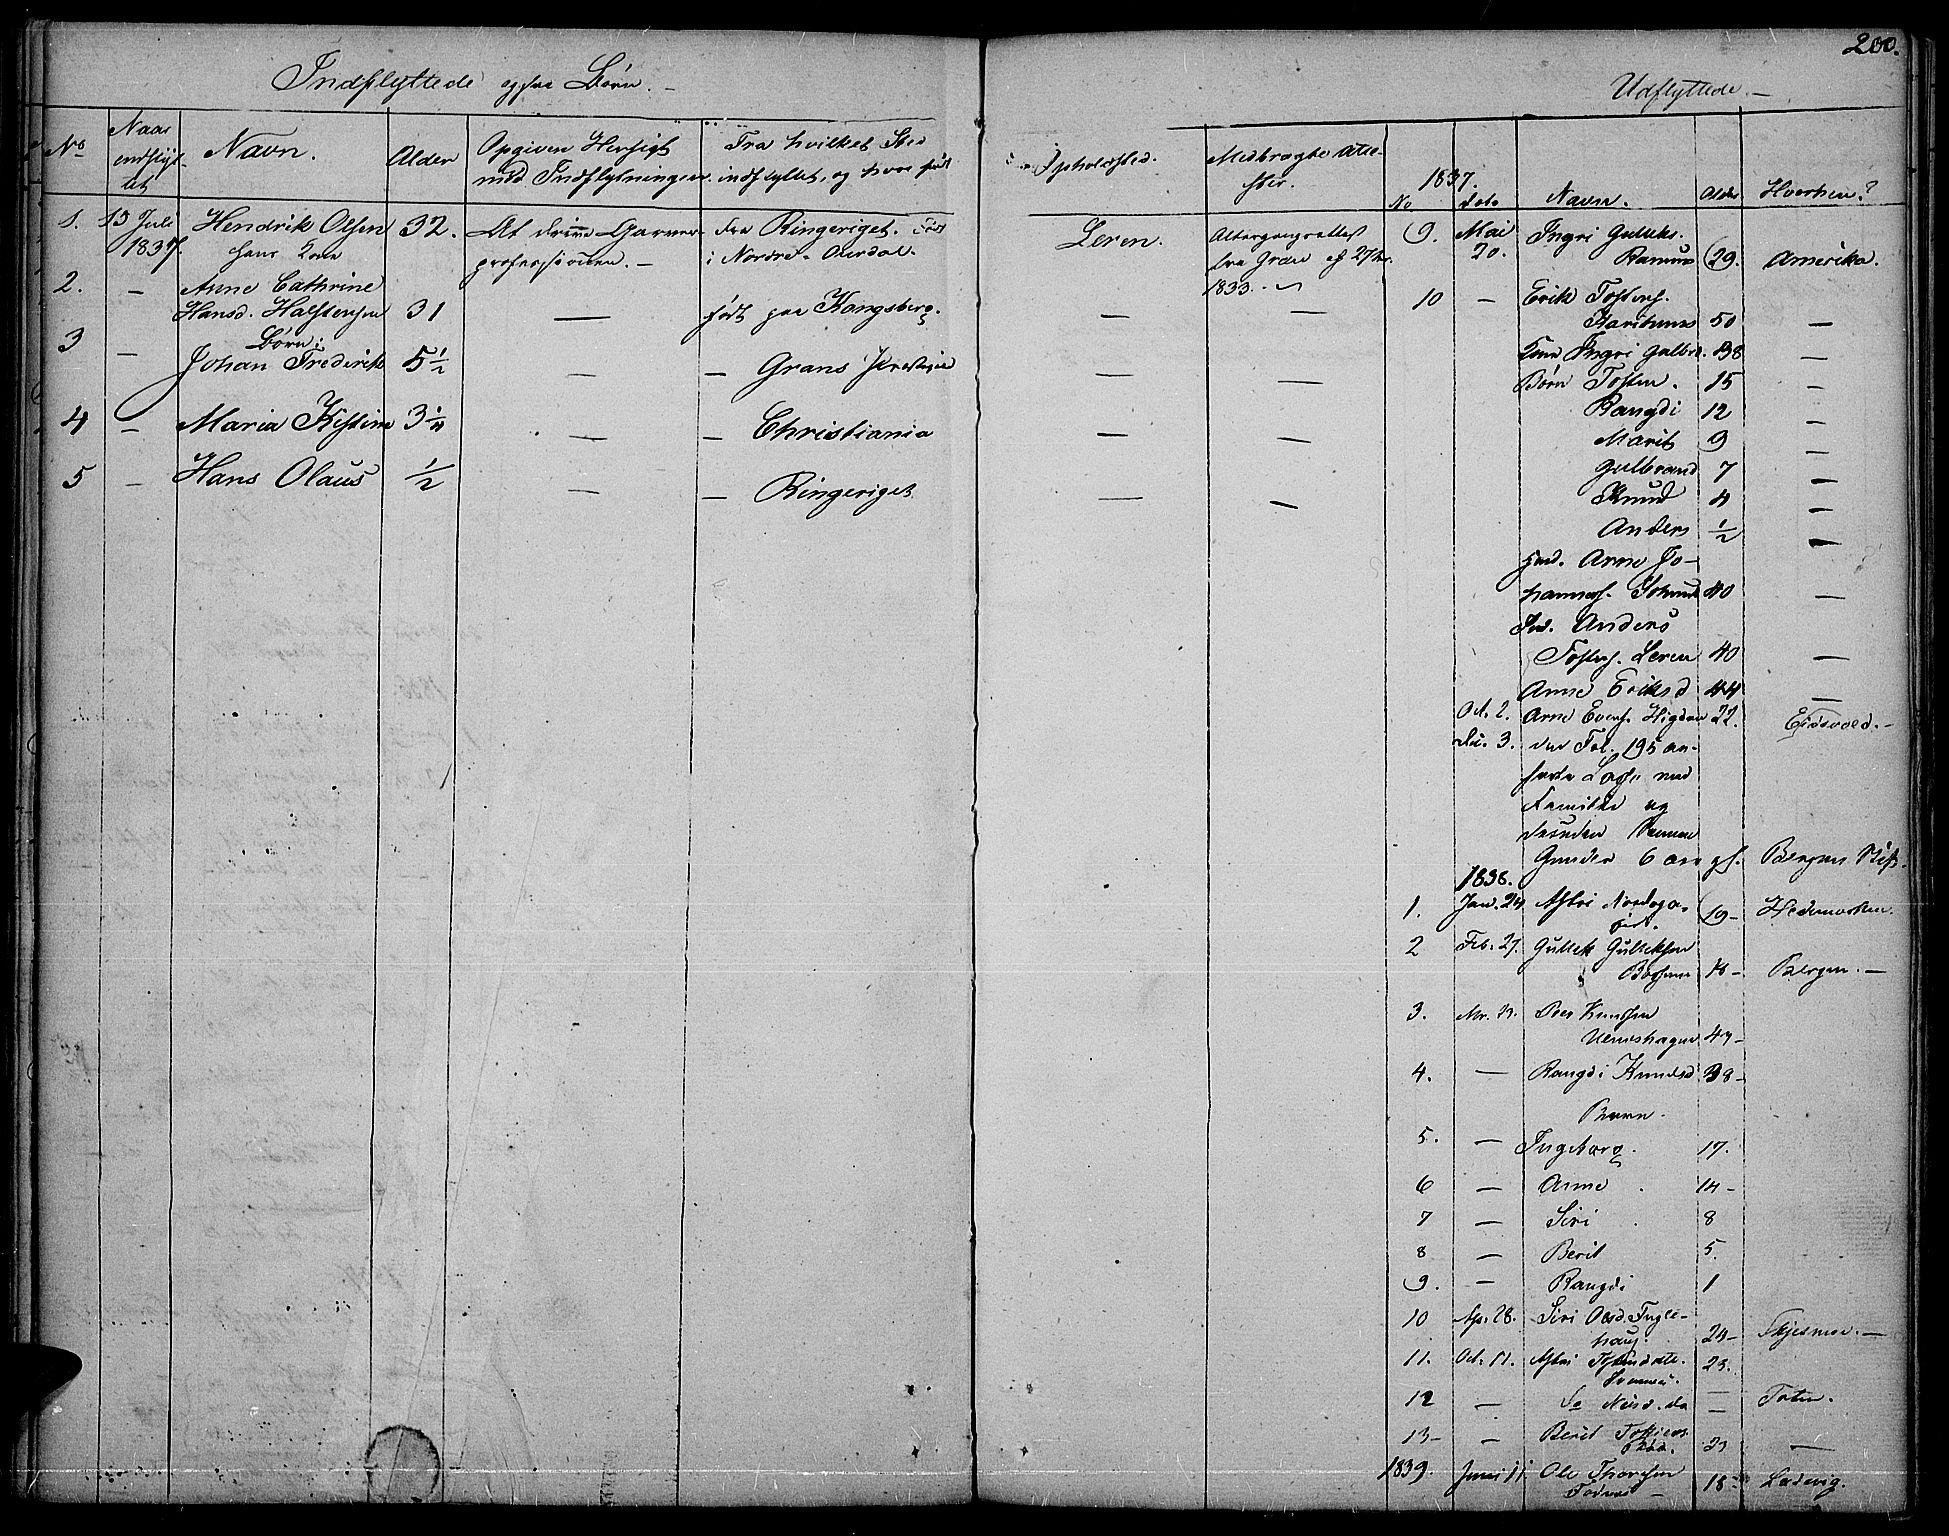 SAH, Nord-Aurdal prestekontor, Ministerialbok nr. 3, 1828-1841, s. 200